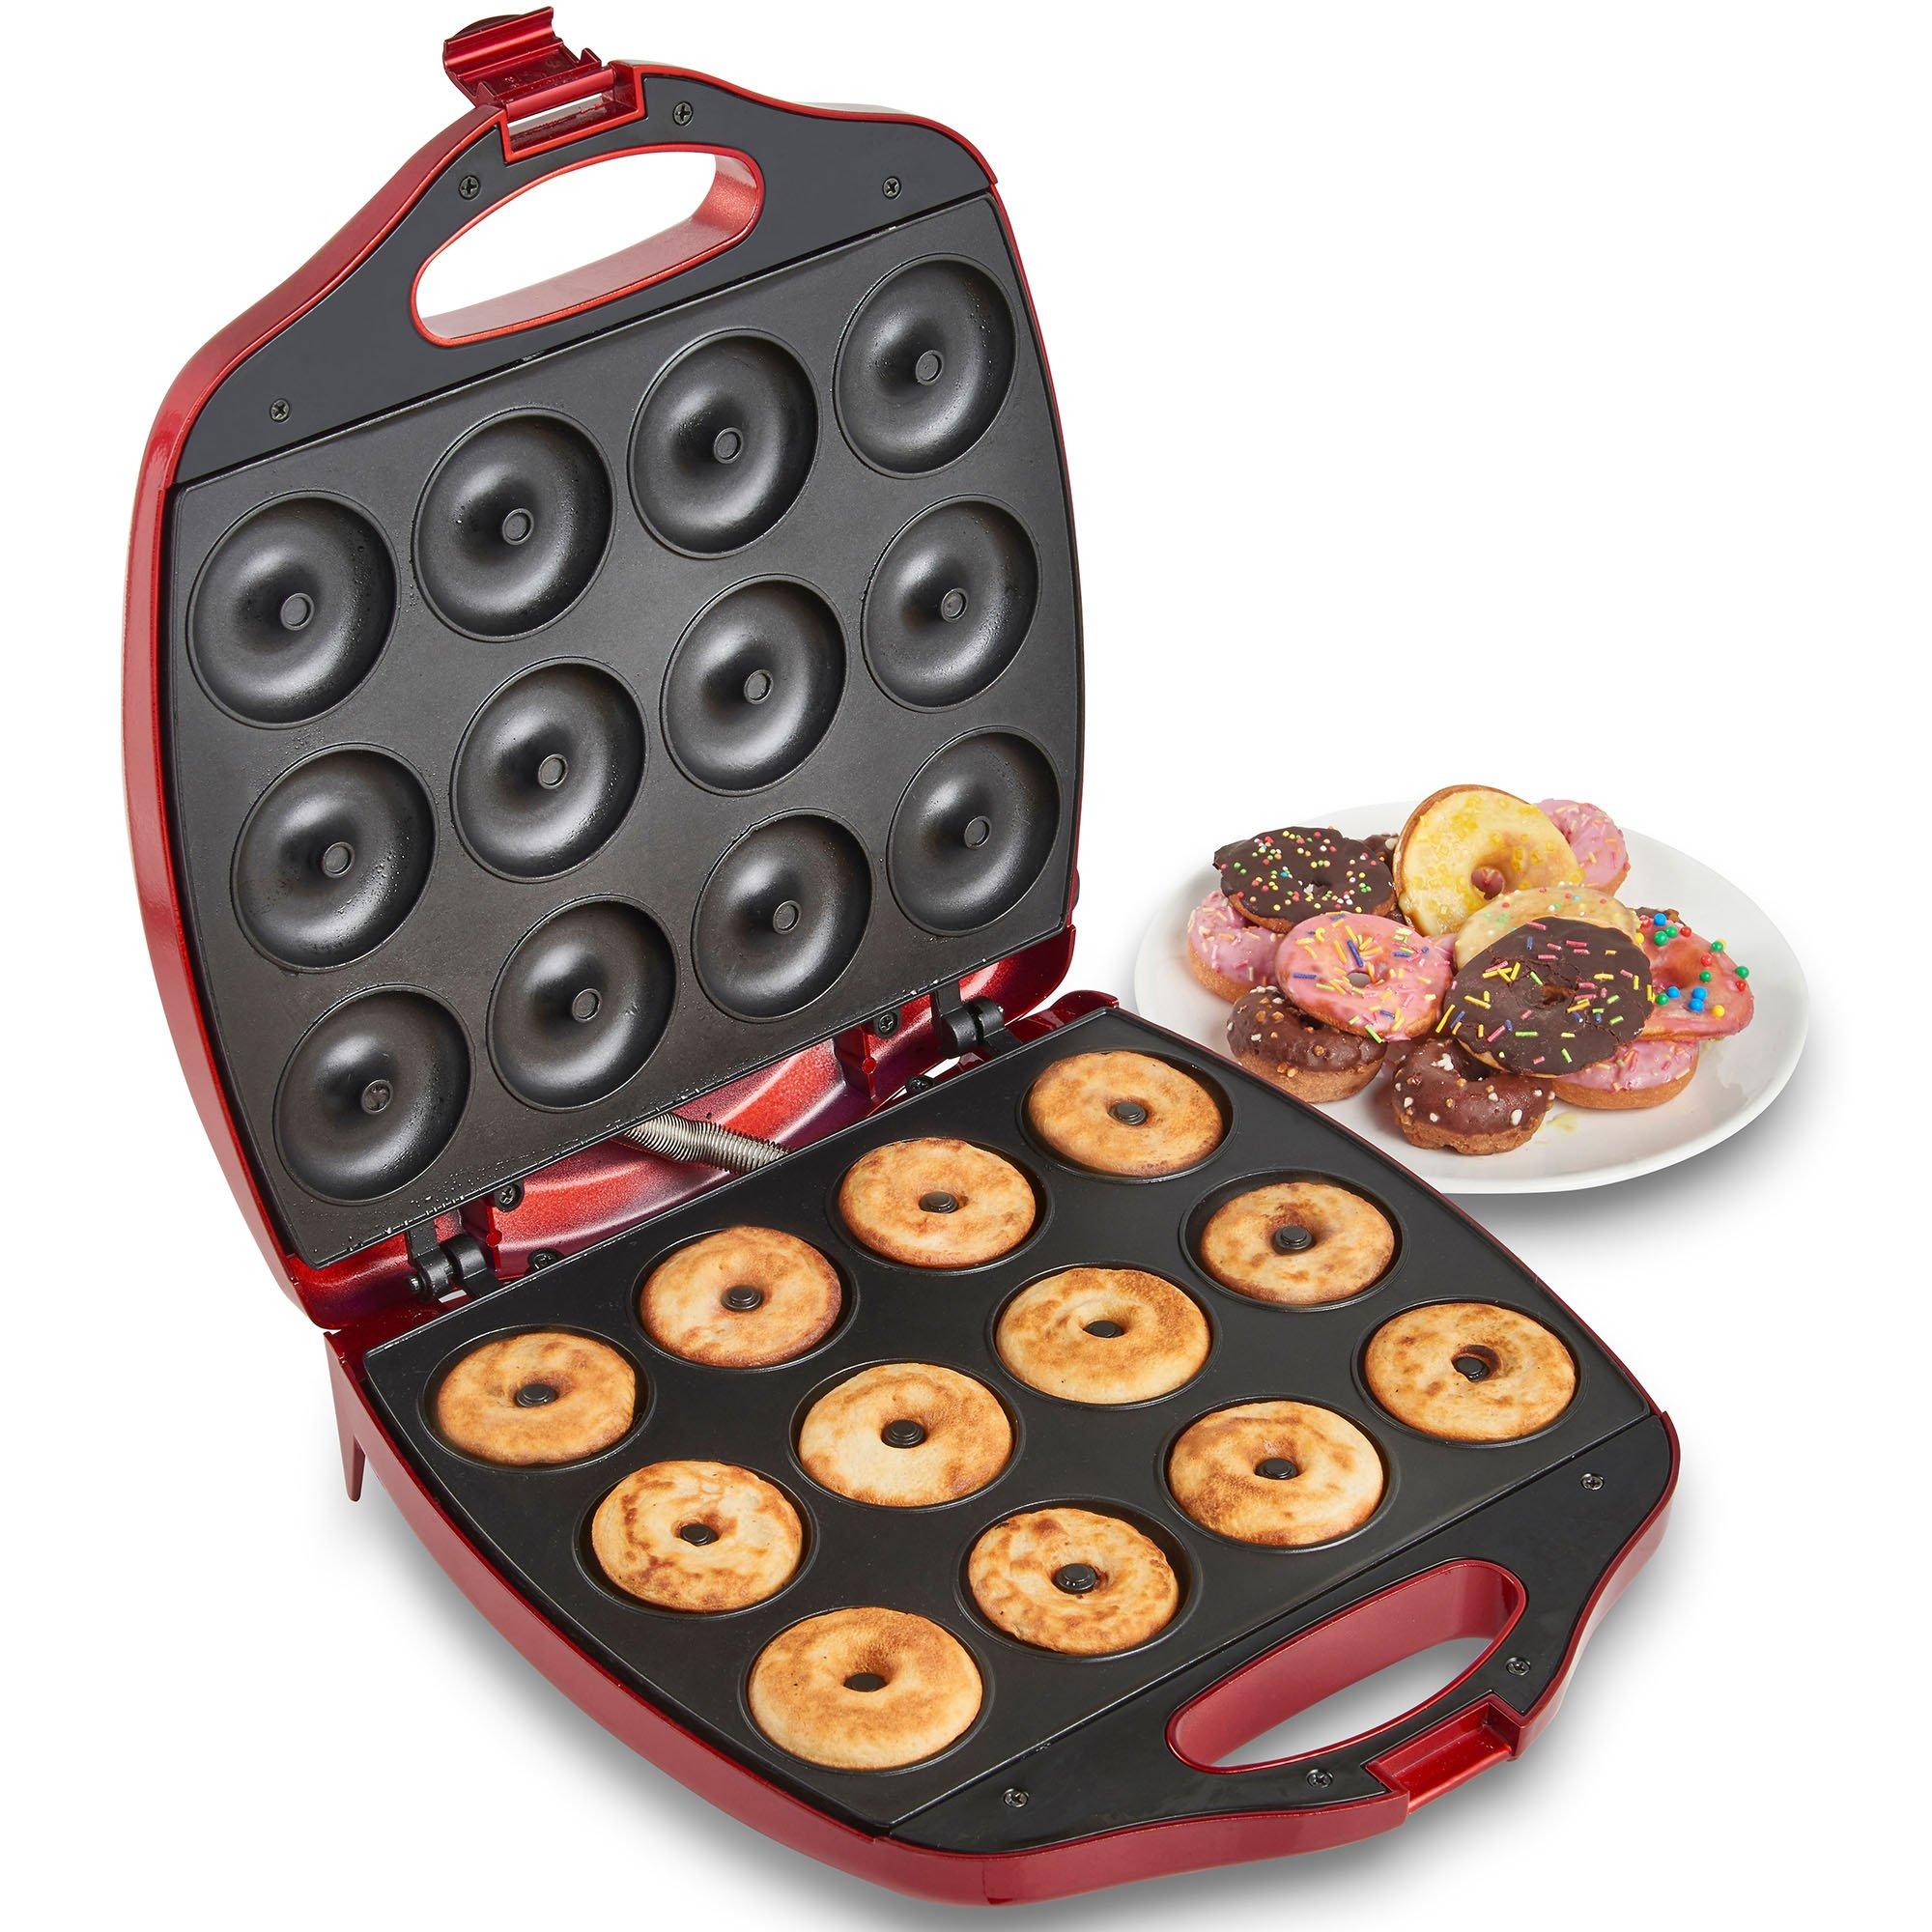 VonShef 12 Mini Donut Electric Maker Kit Set, Small Donut Snack Machine, Red by VonShef